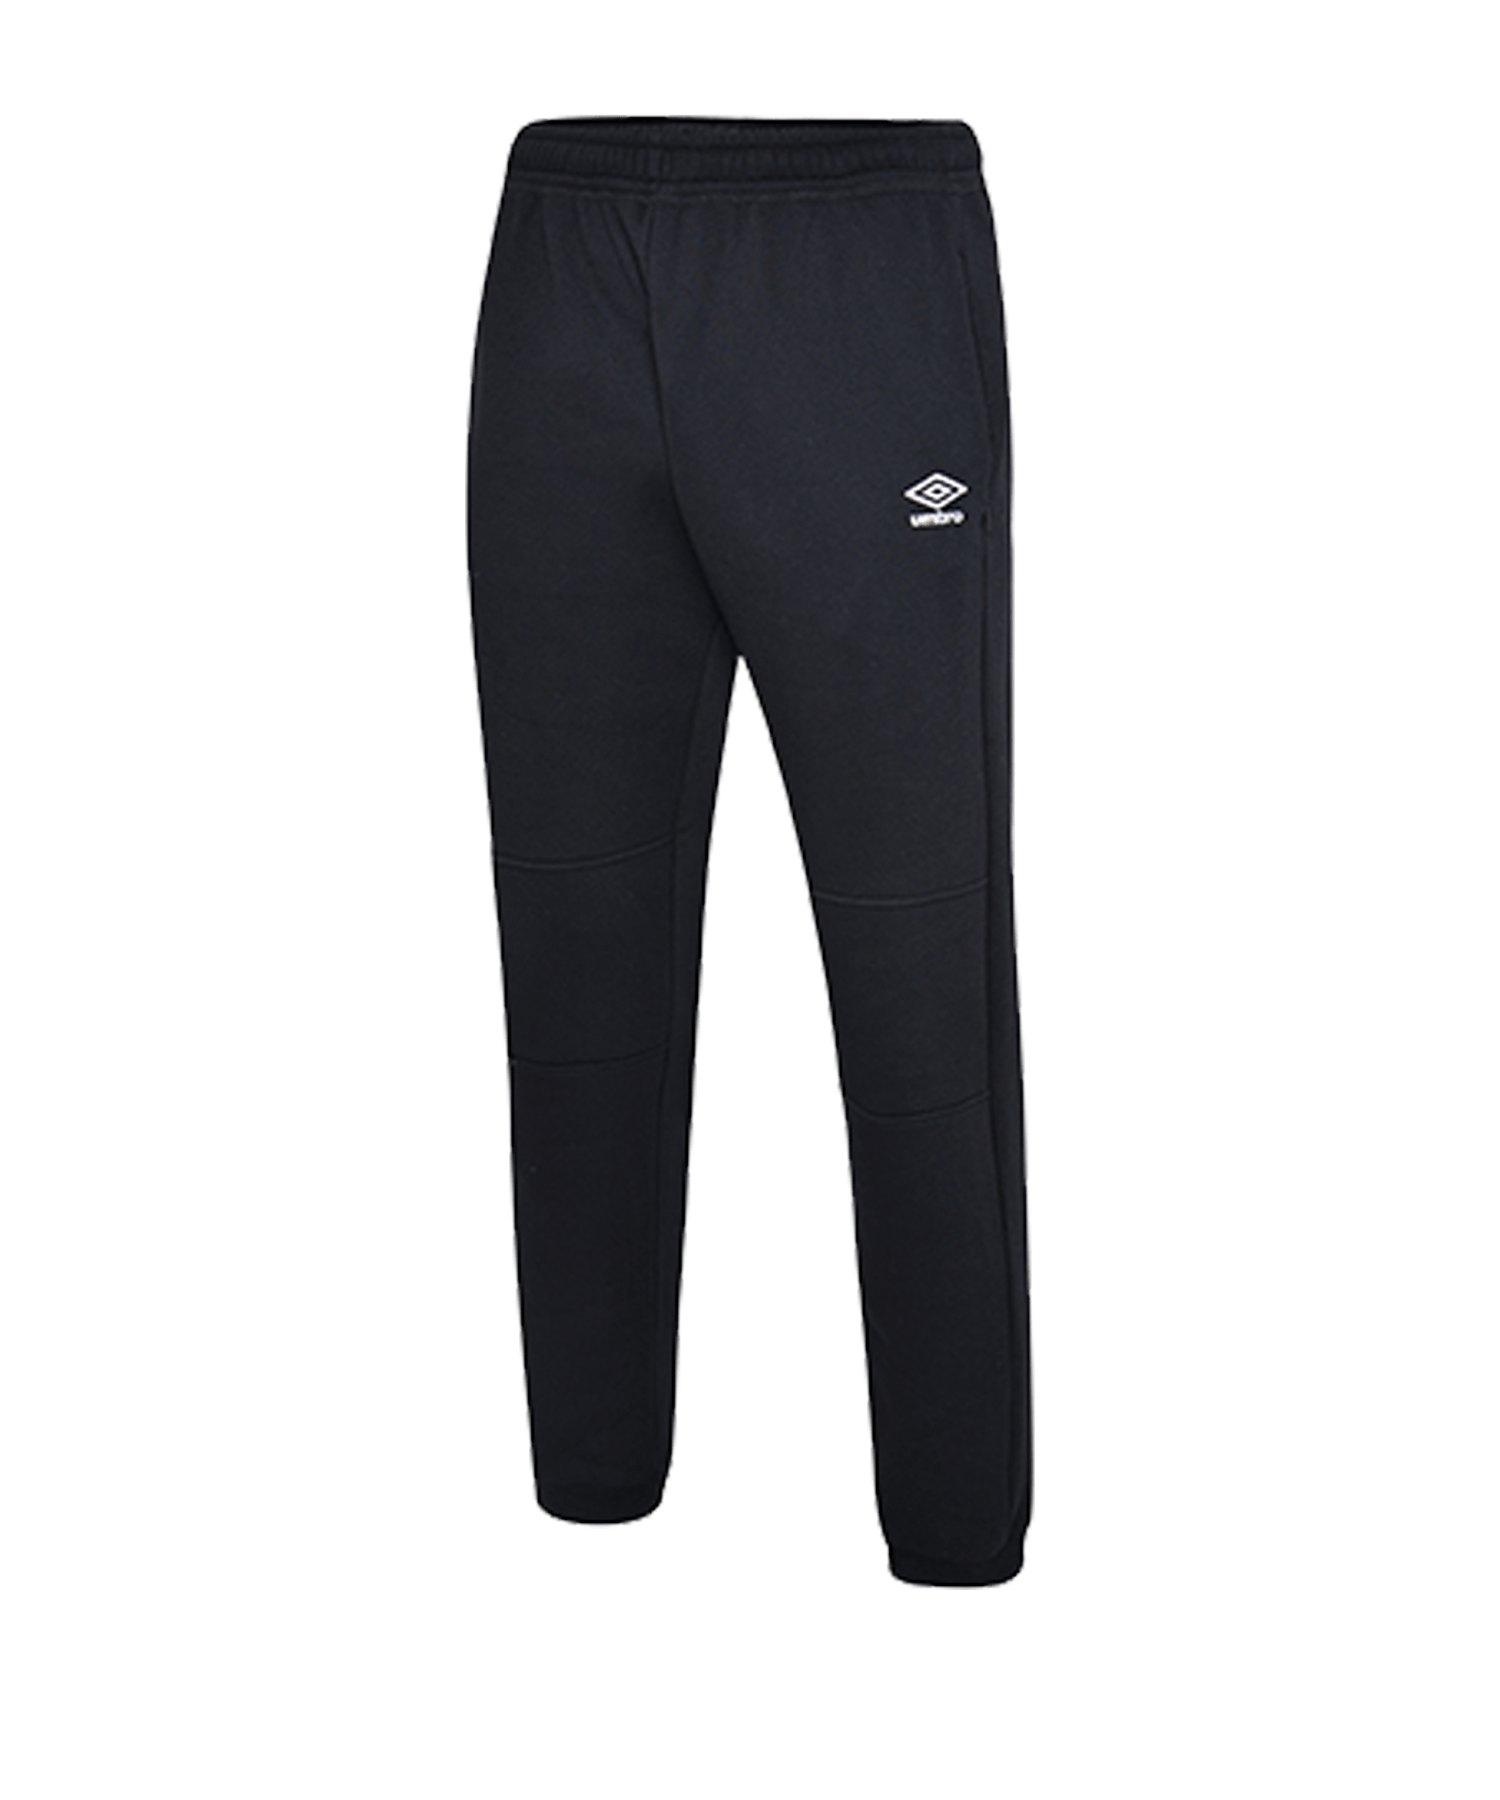 Umbro Club Leisure Jogginghose Schwarz F090 - schwarz